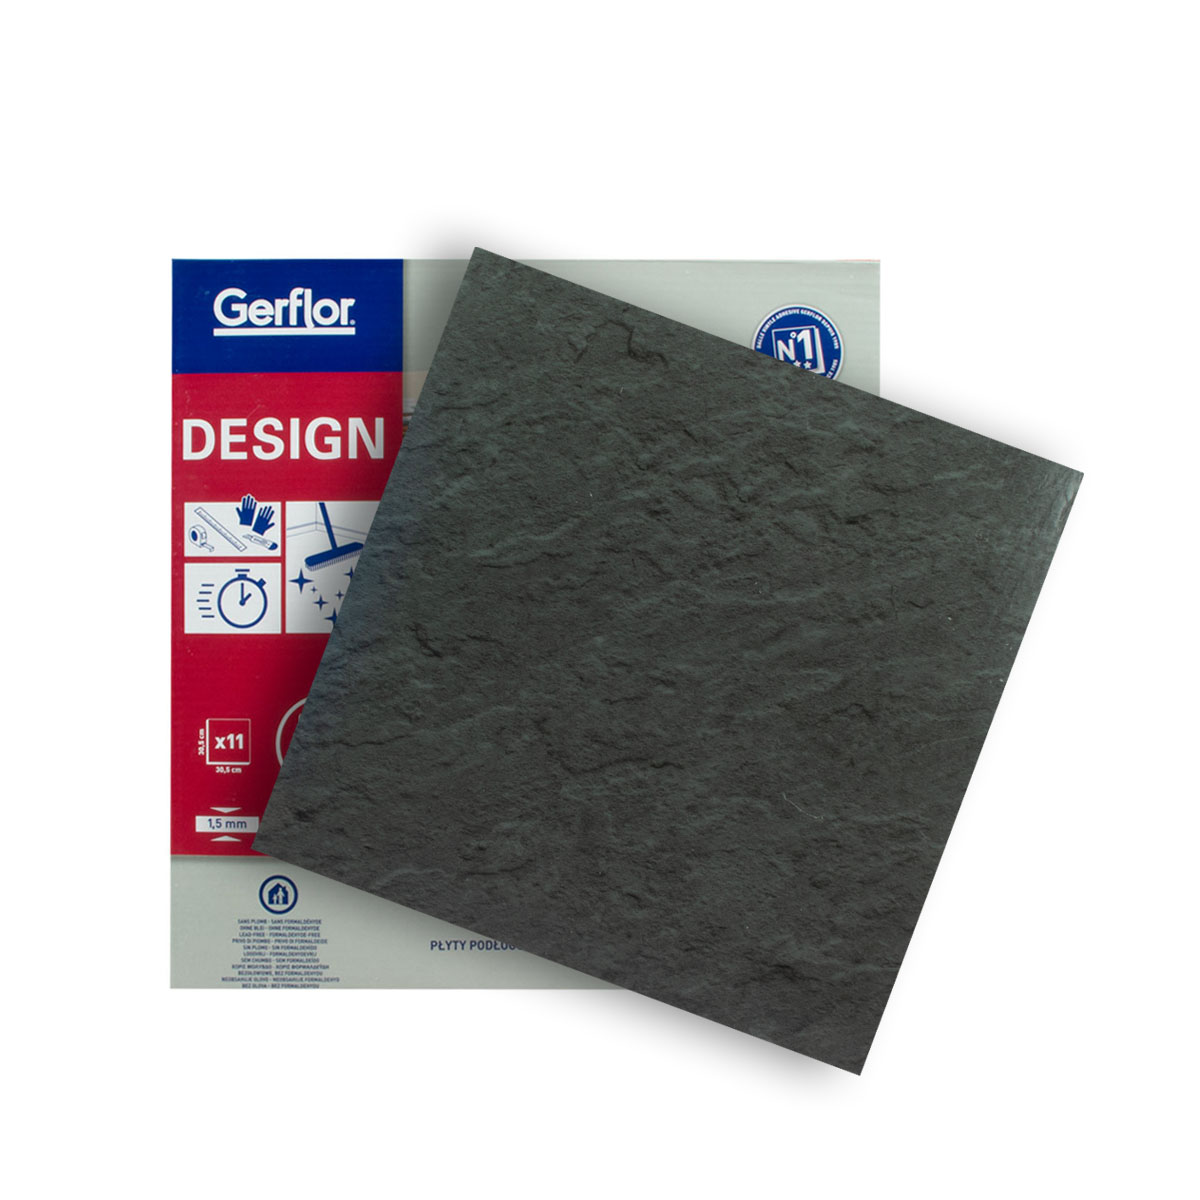 Gerflor Vinyl Design Fliese 0220 Slate Anthracite 1qm, selbstklebend